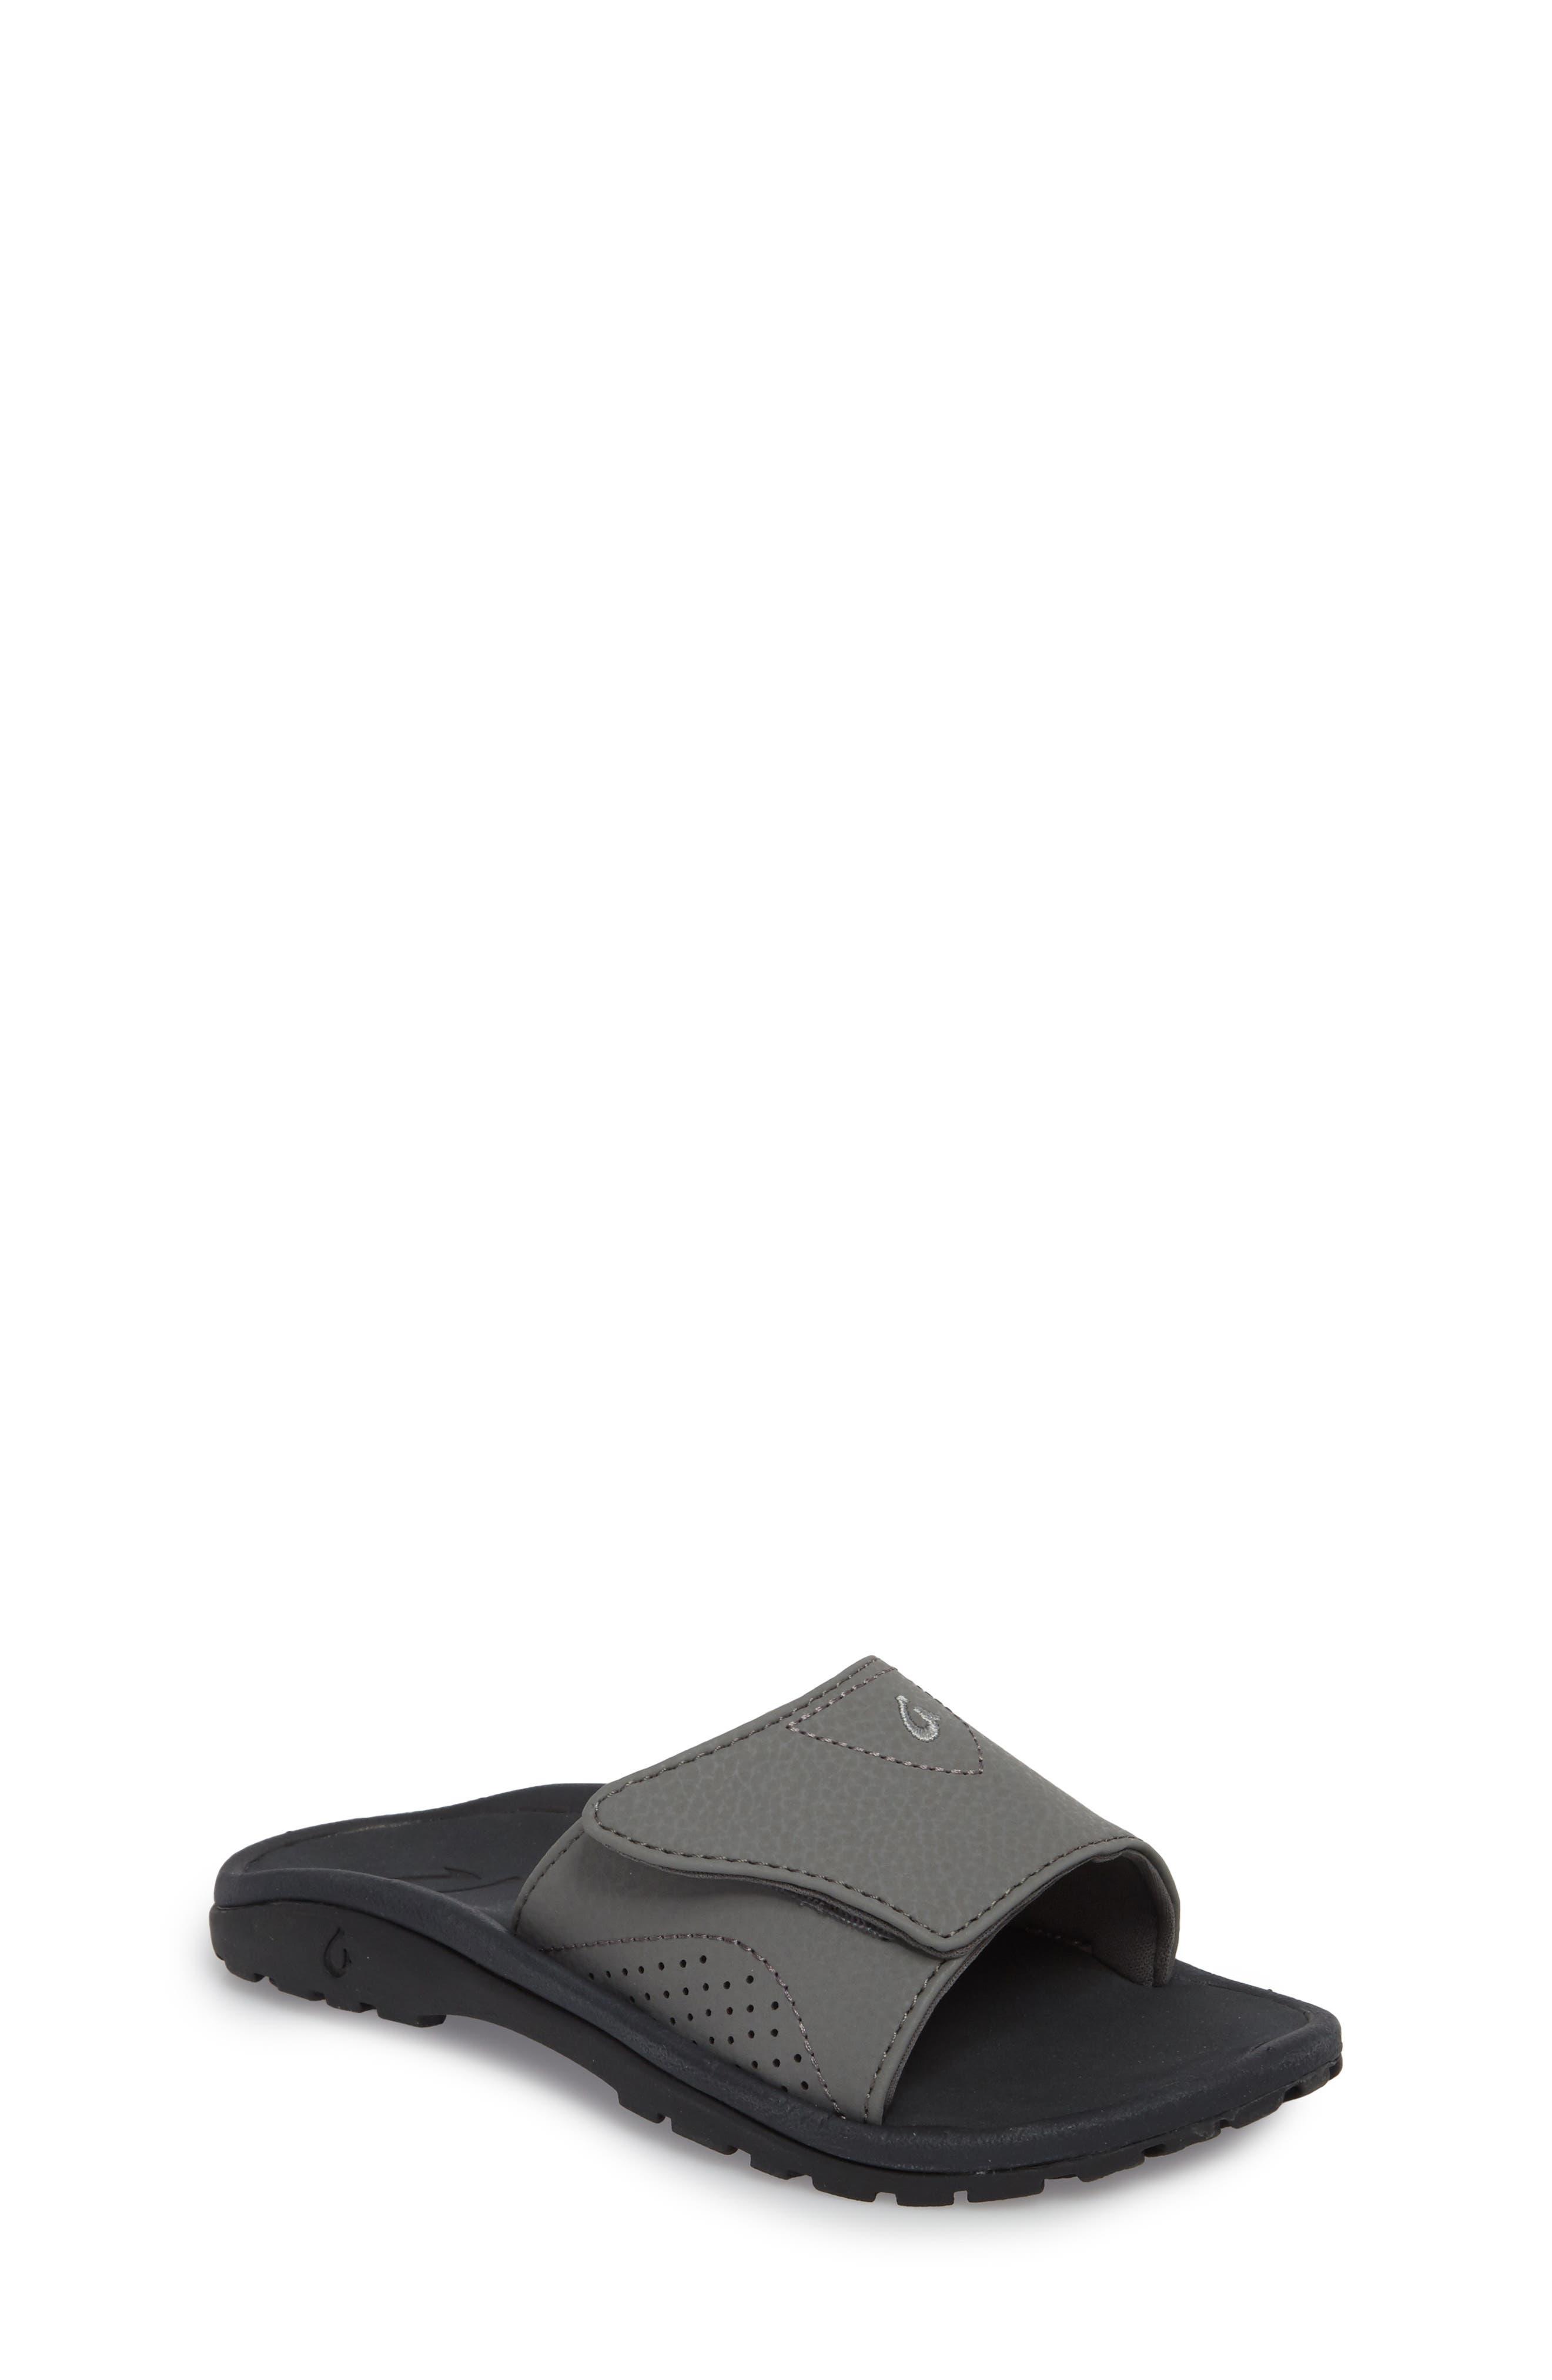 Nalu Slide Sandal,                         Main,                         color, CHARCOAL/ LAVA ROCK